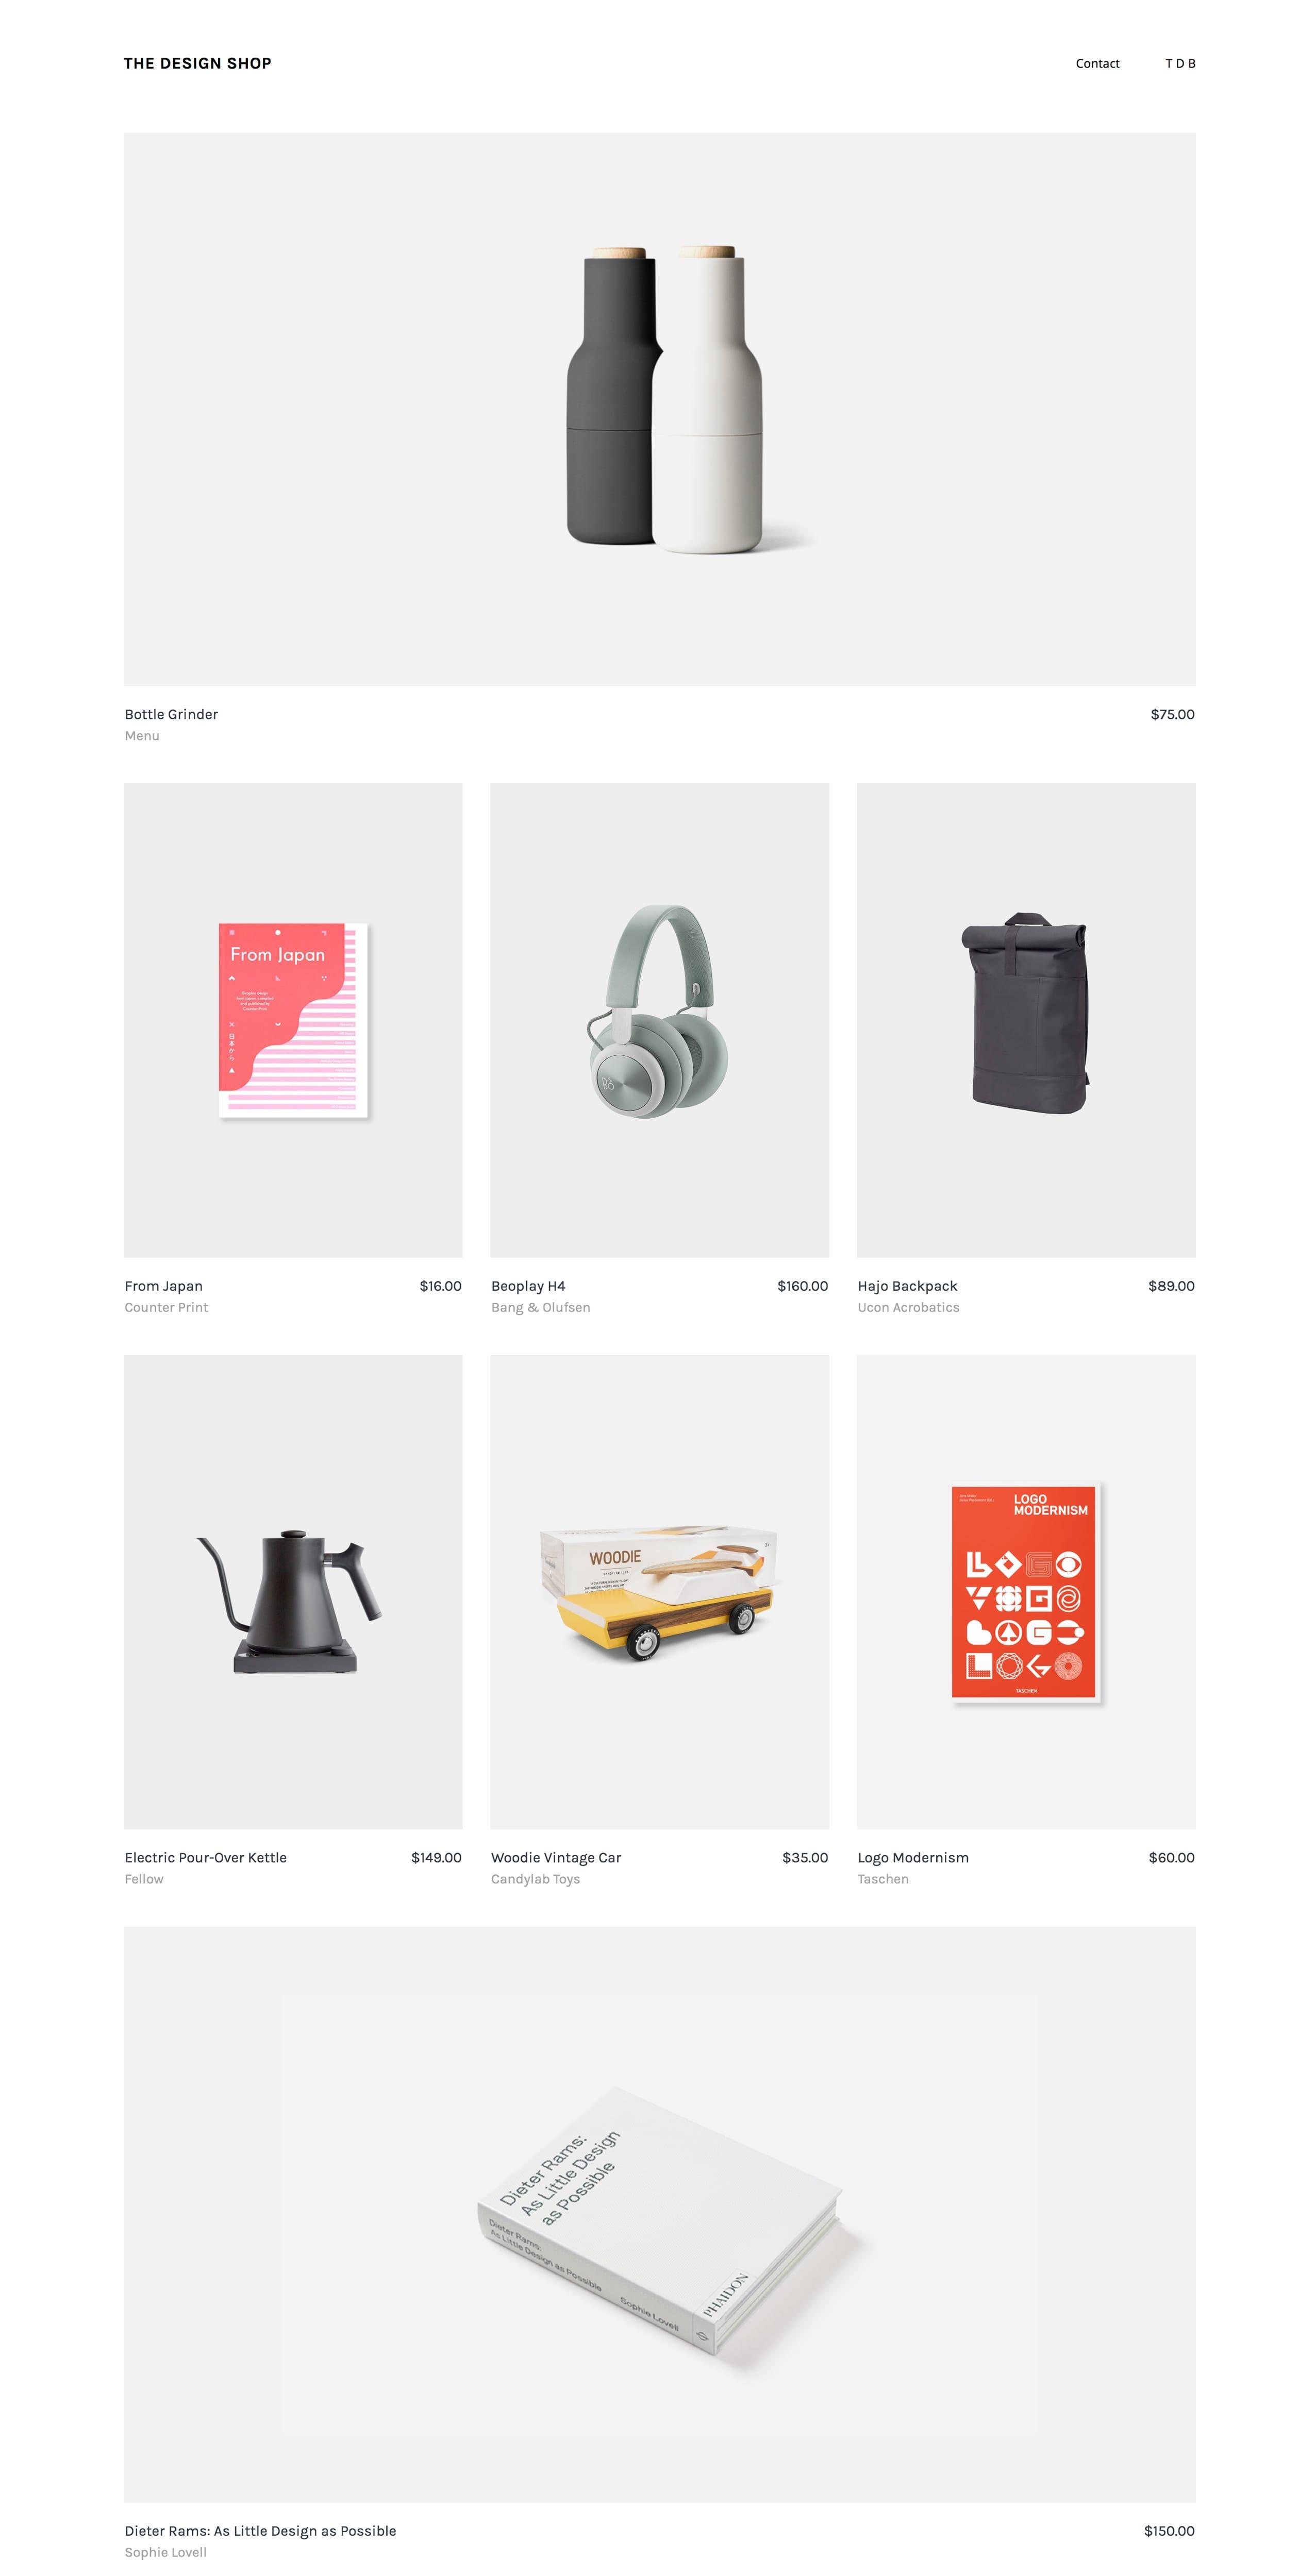 Design shop landing page